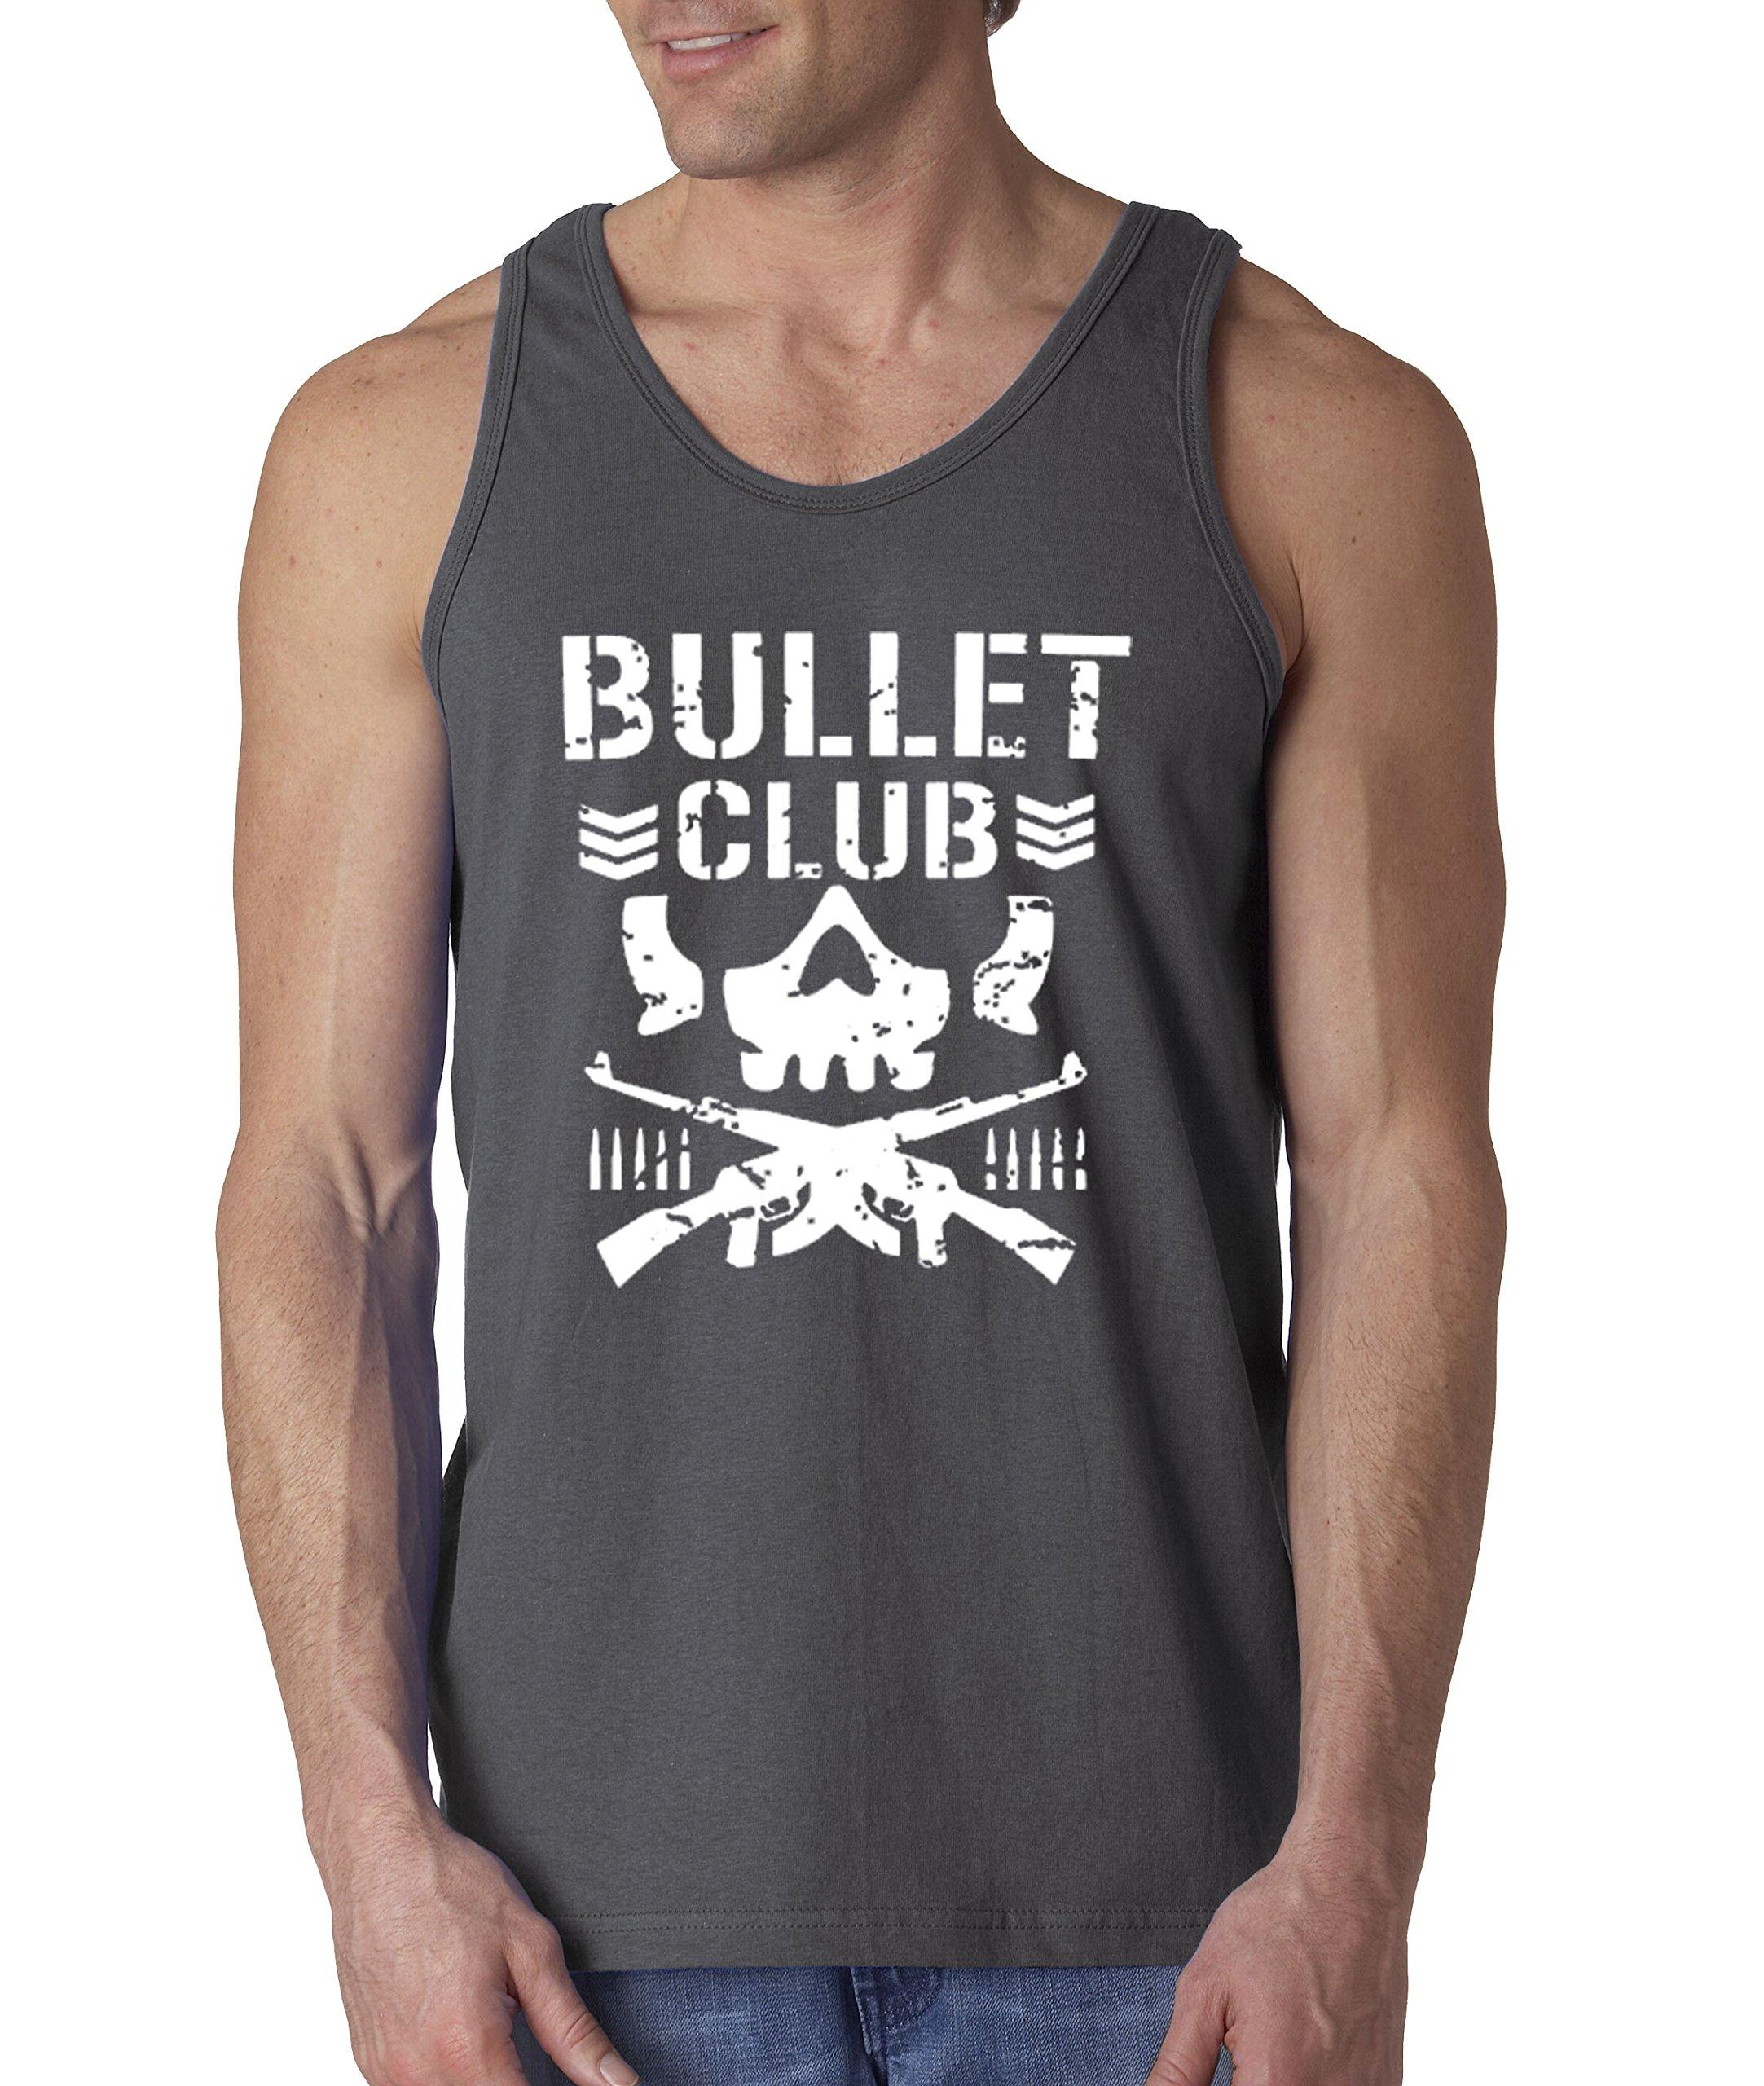 New Way 786 - Men's Tank-Top Bullet Club Skull Bone Soldier Japan Pro Wrestling Medium Charcoal